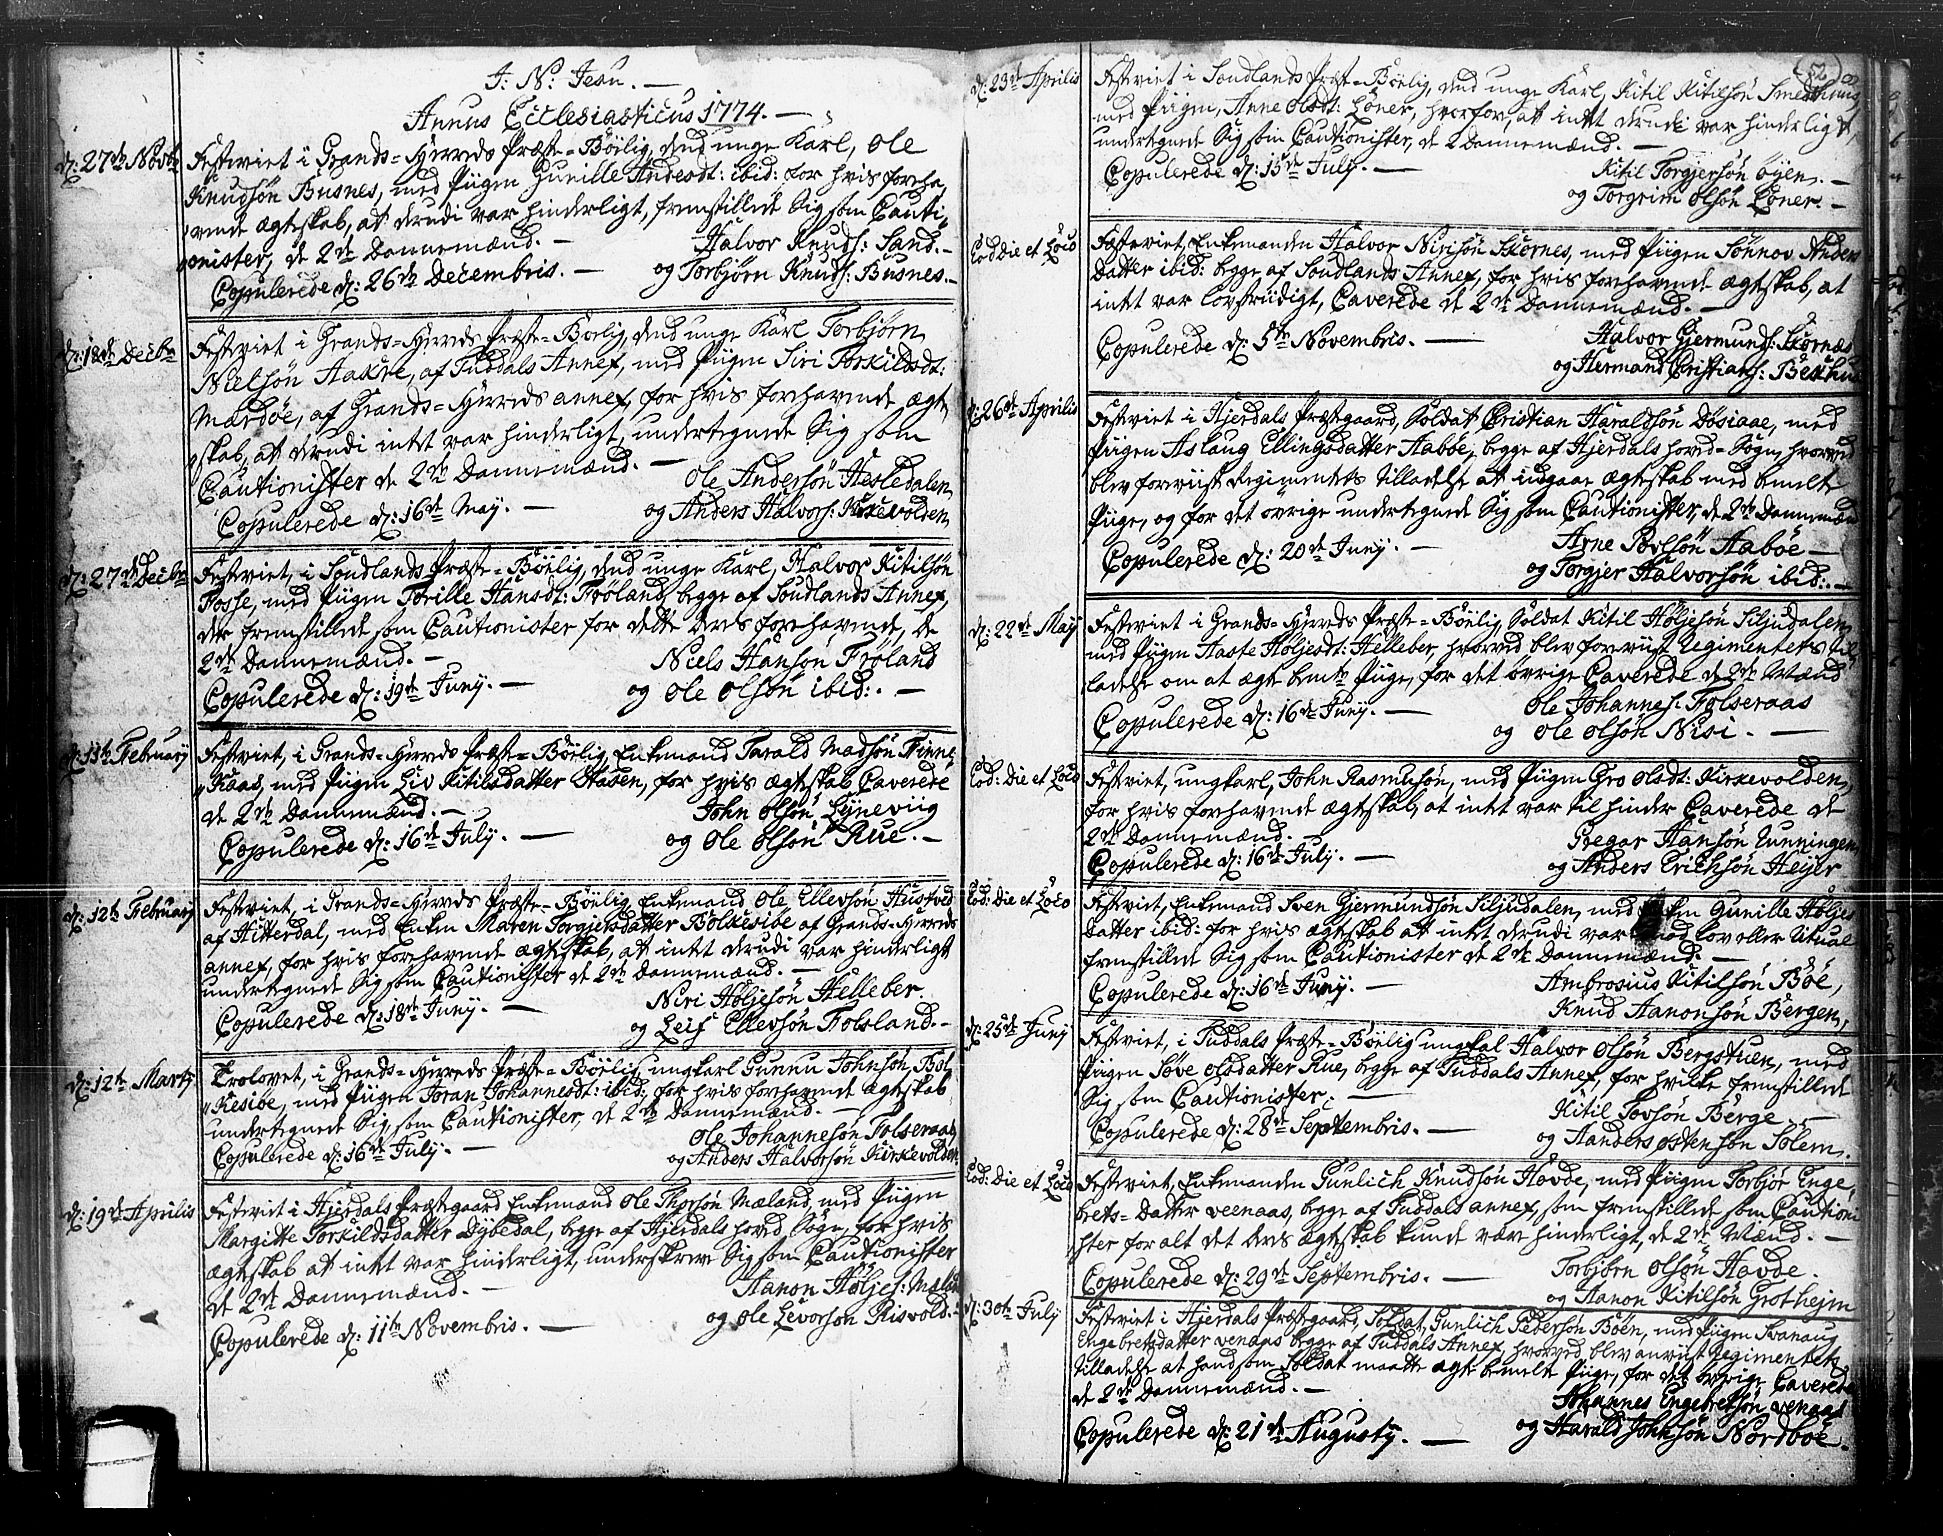 SAKO, Hjartdal kirkebøker, F/Fa/L0004: Ministerialbok nr. I 4, 1727-1795, s. 52